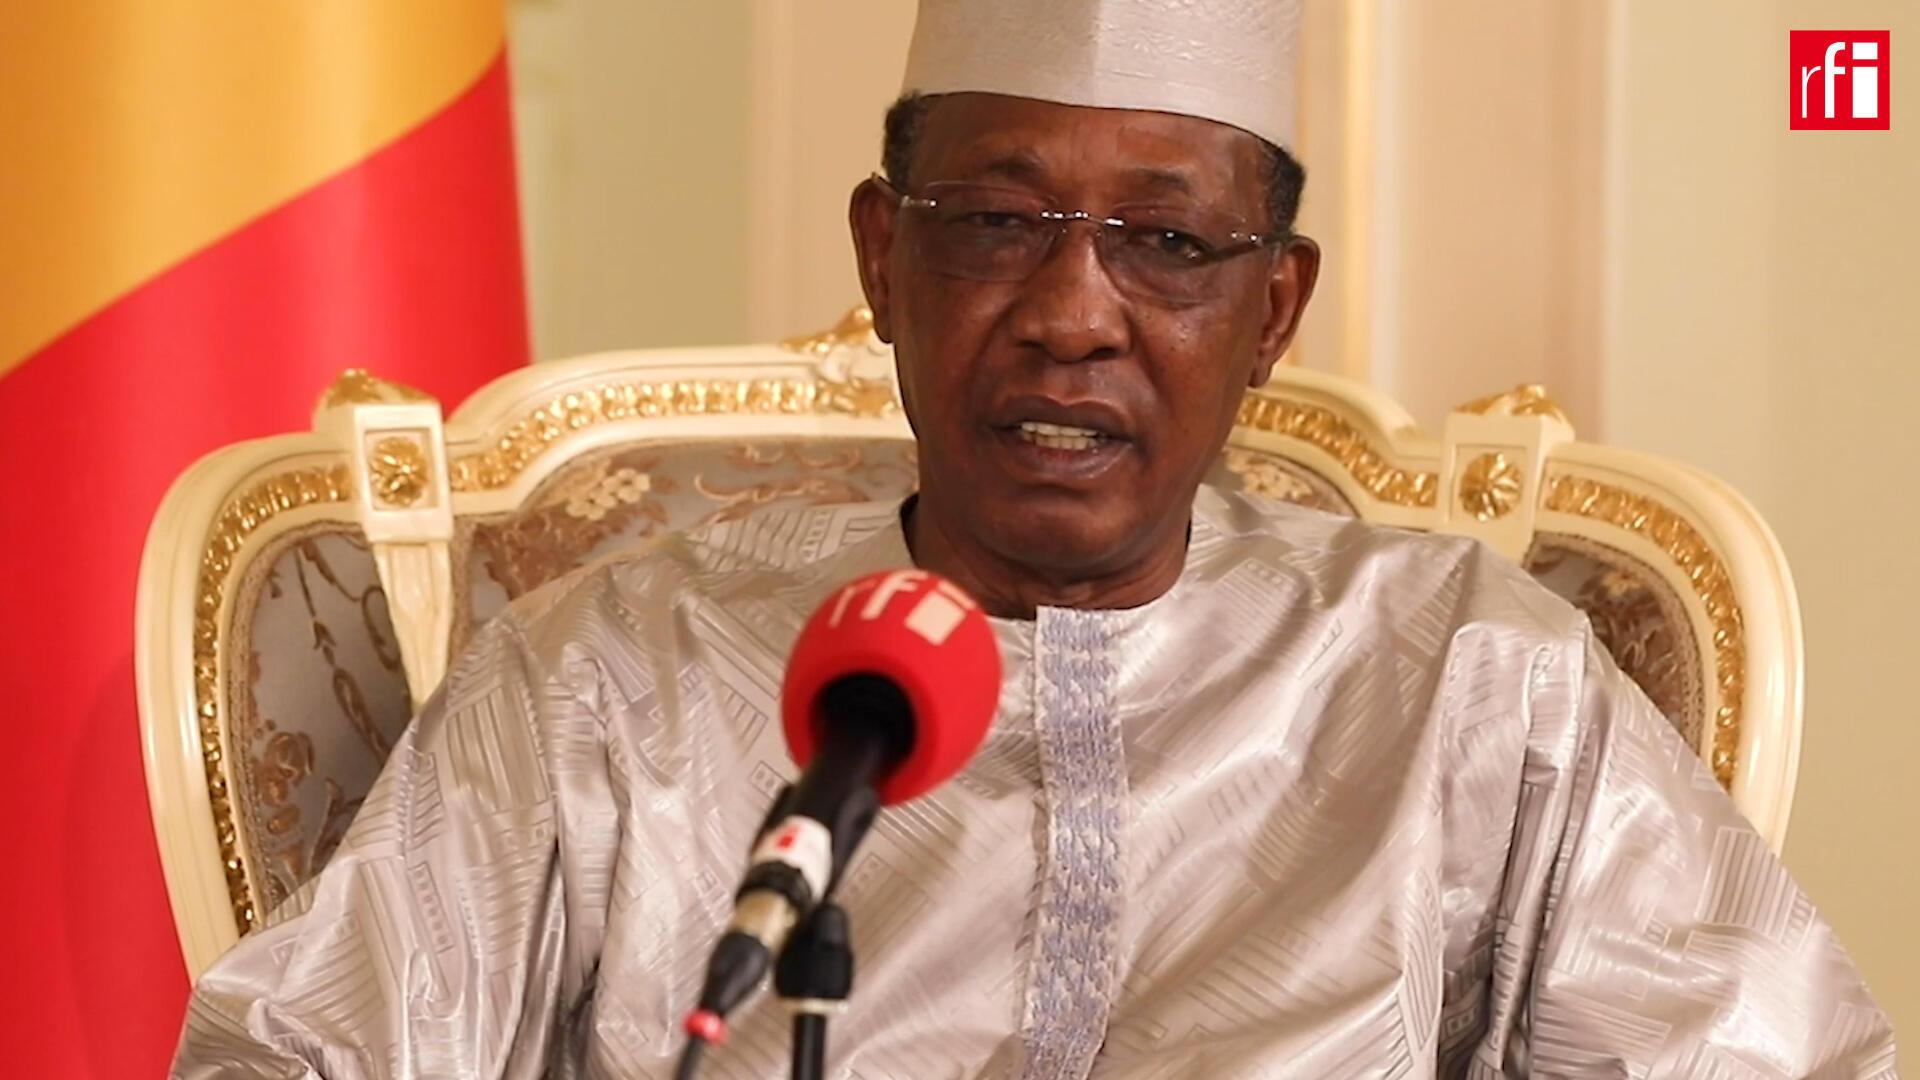 Idriss Déby Itno, rais wa Chad